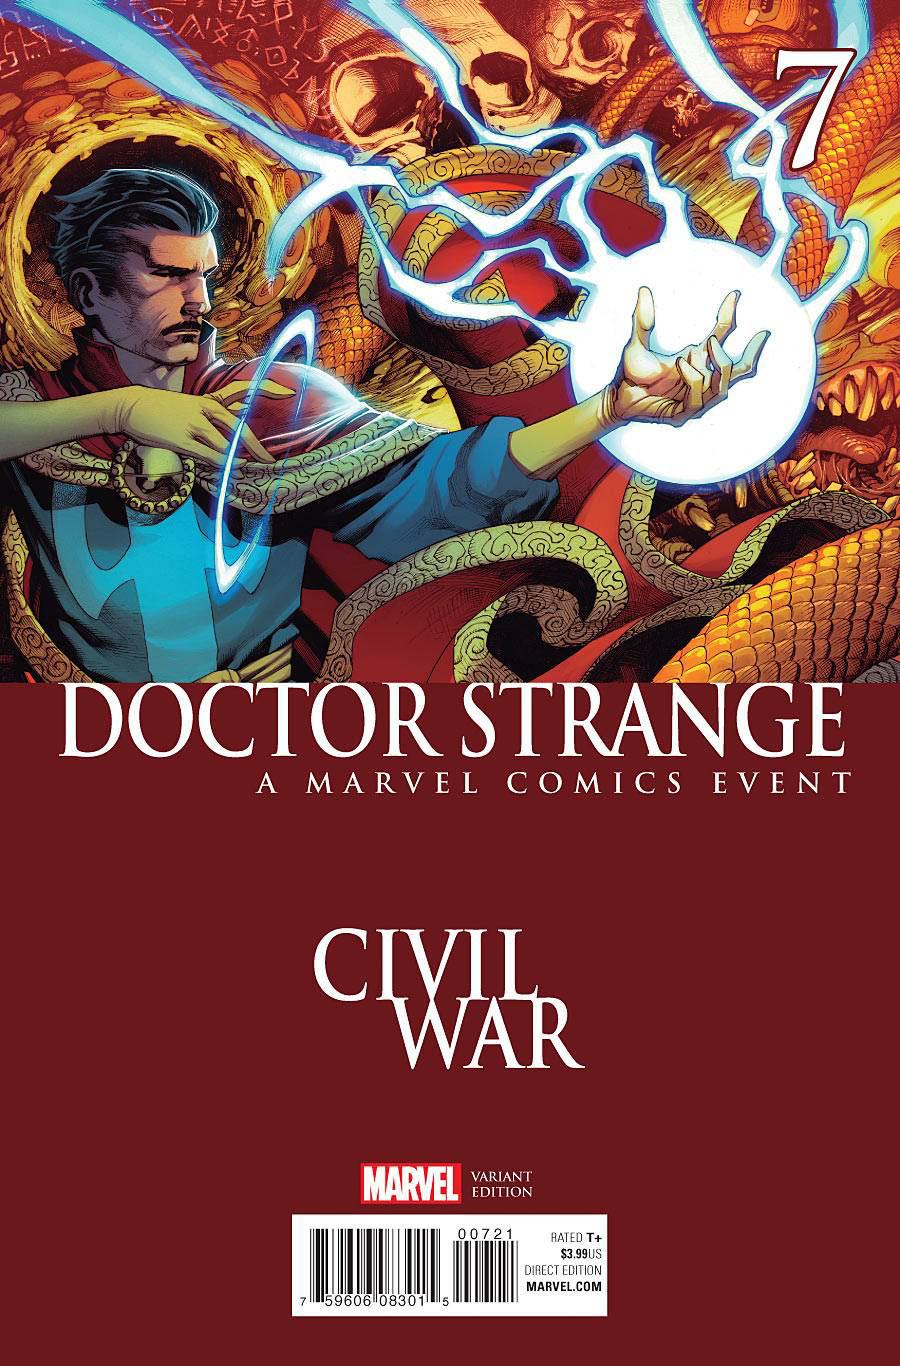 Doctor Strange Vol 4 #7 Cover B Variant Civil War Cover